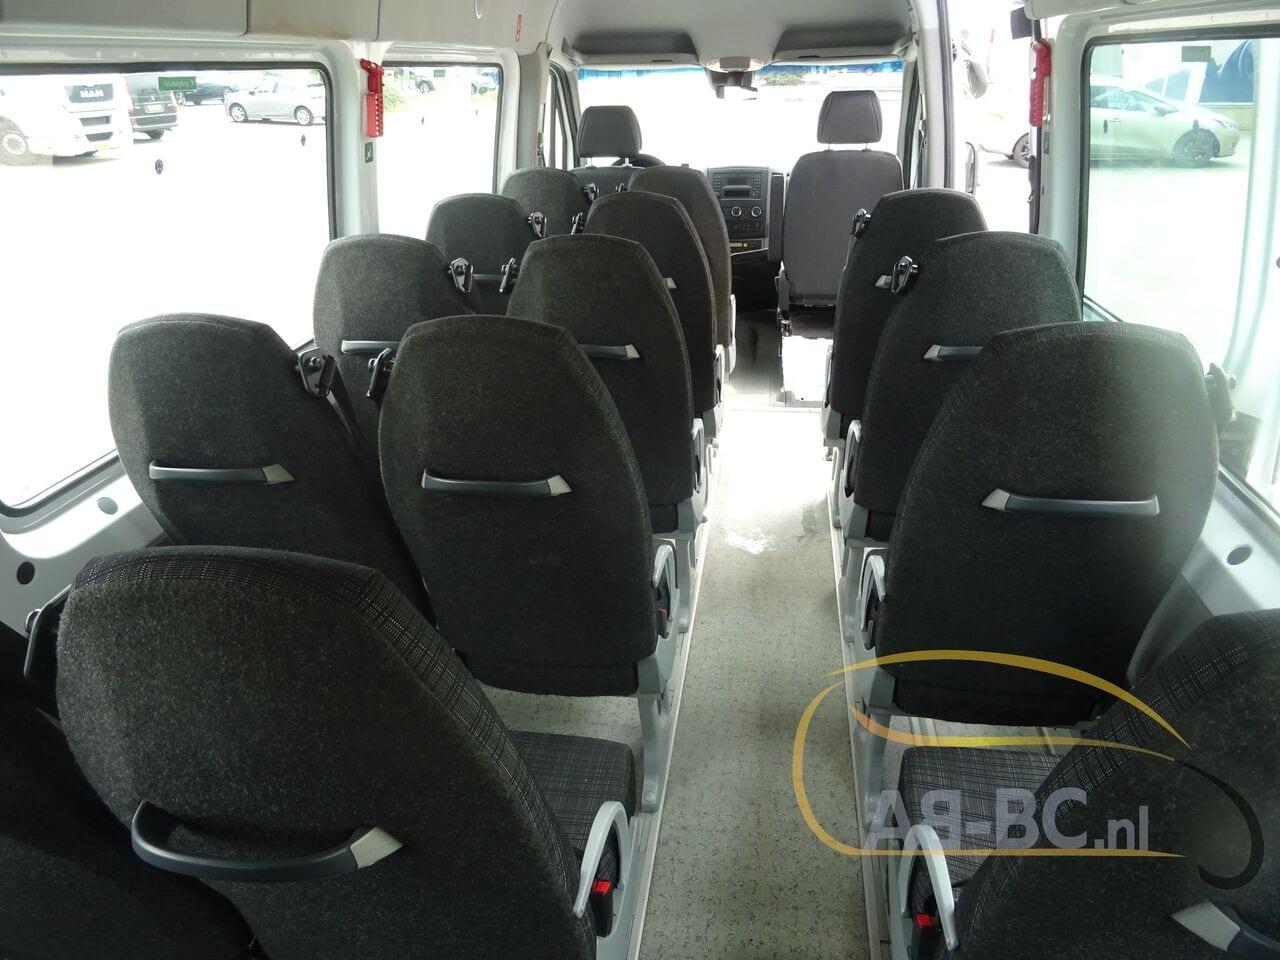 coach-busMERCEDES-BENZ-516-CDI-Sprinter-Transfer-45-23-Seats-EURO-6---1625235081061471408_big_367b89e1416aa37939cf4f69cb1449b1--21060112394245379500